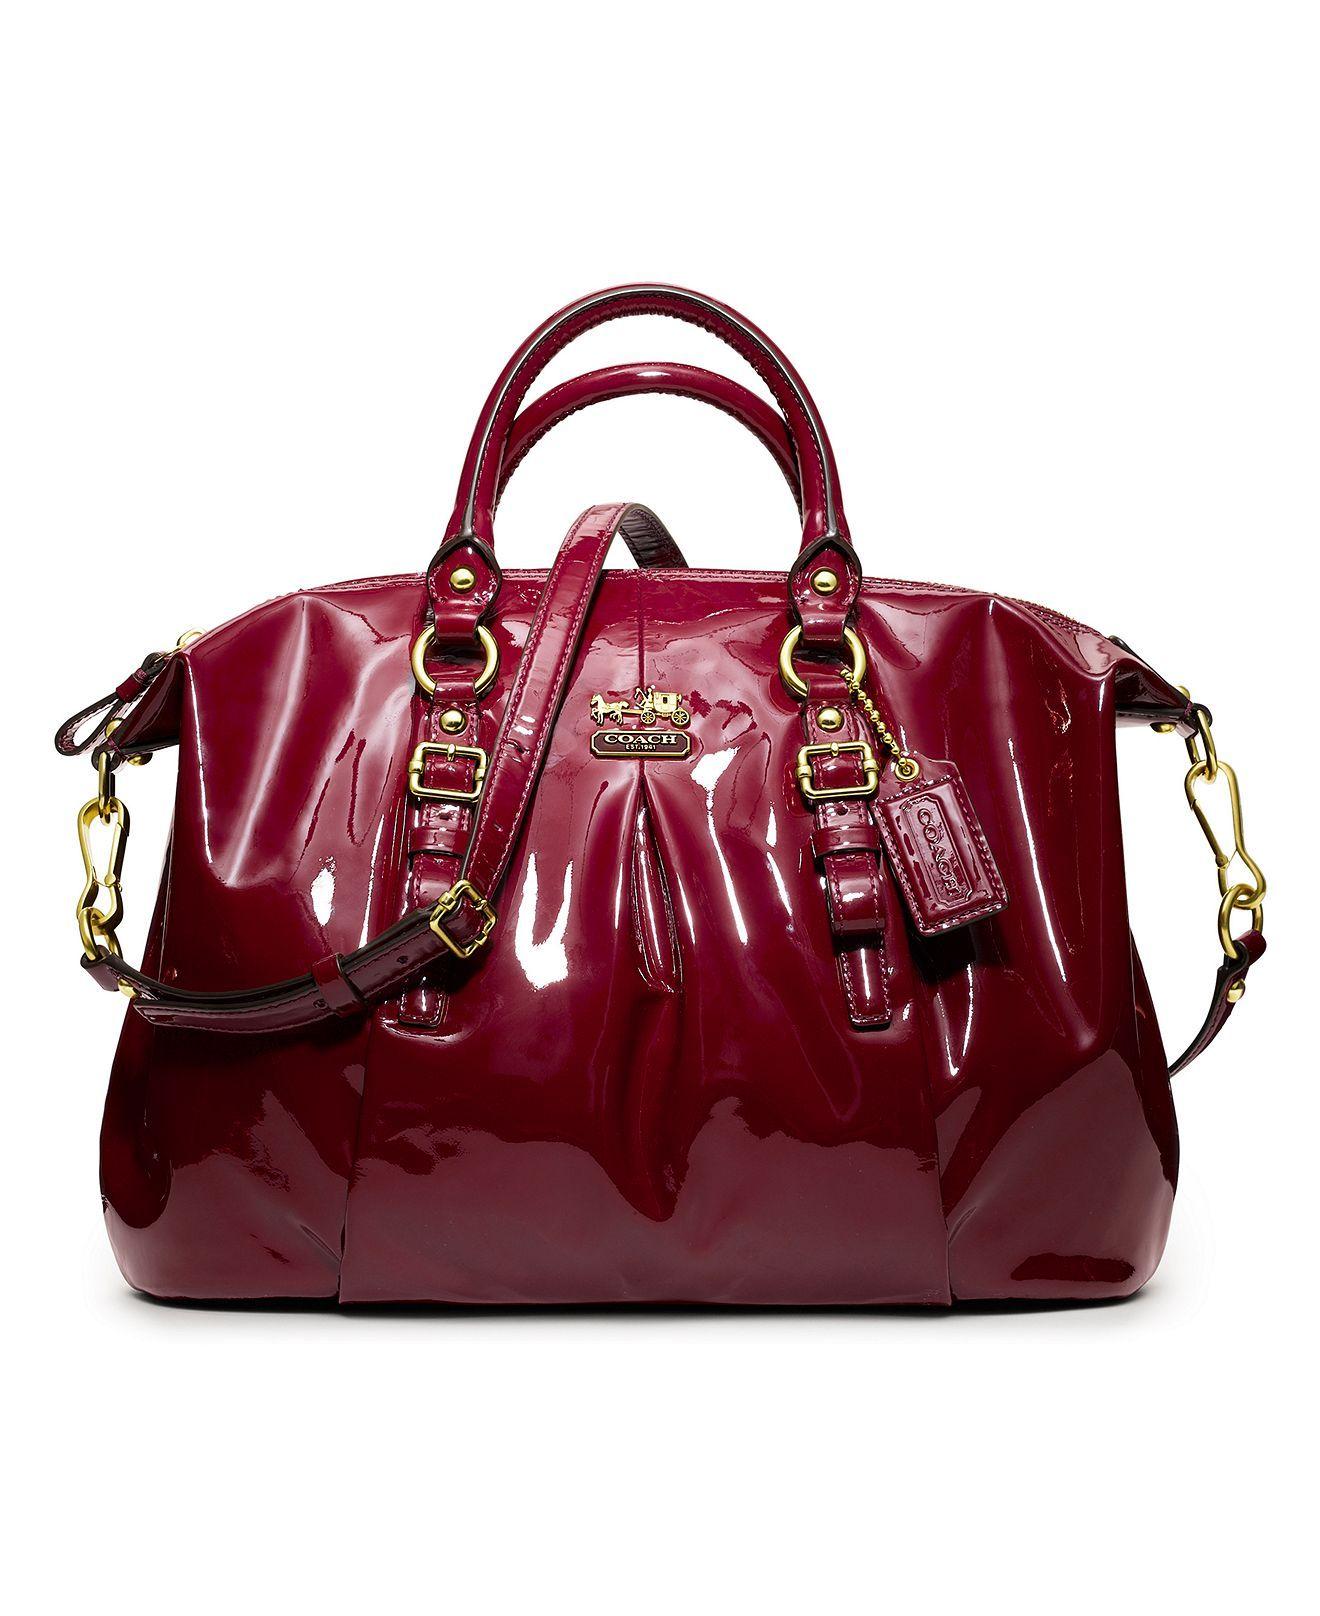 d9dfd2f7d2 COACH MADISON PATENT JULIETTE - Coach Handbags - Handbags   Accessories -  Macy s